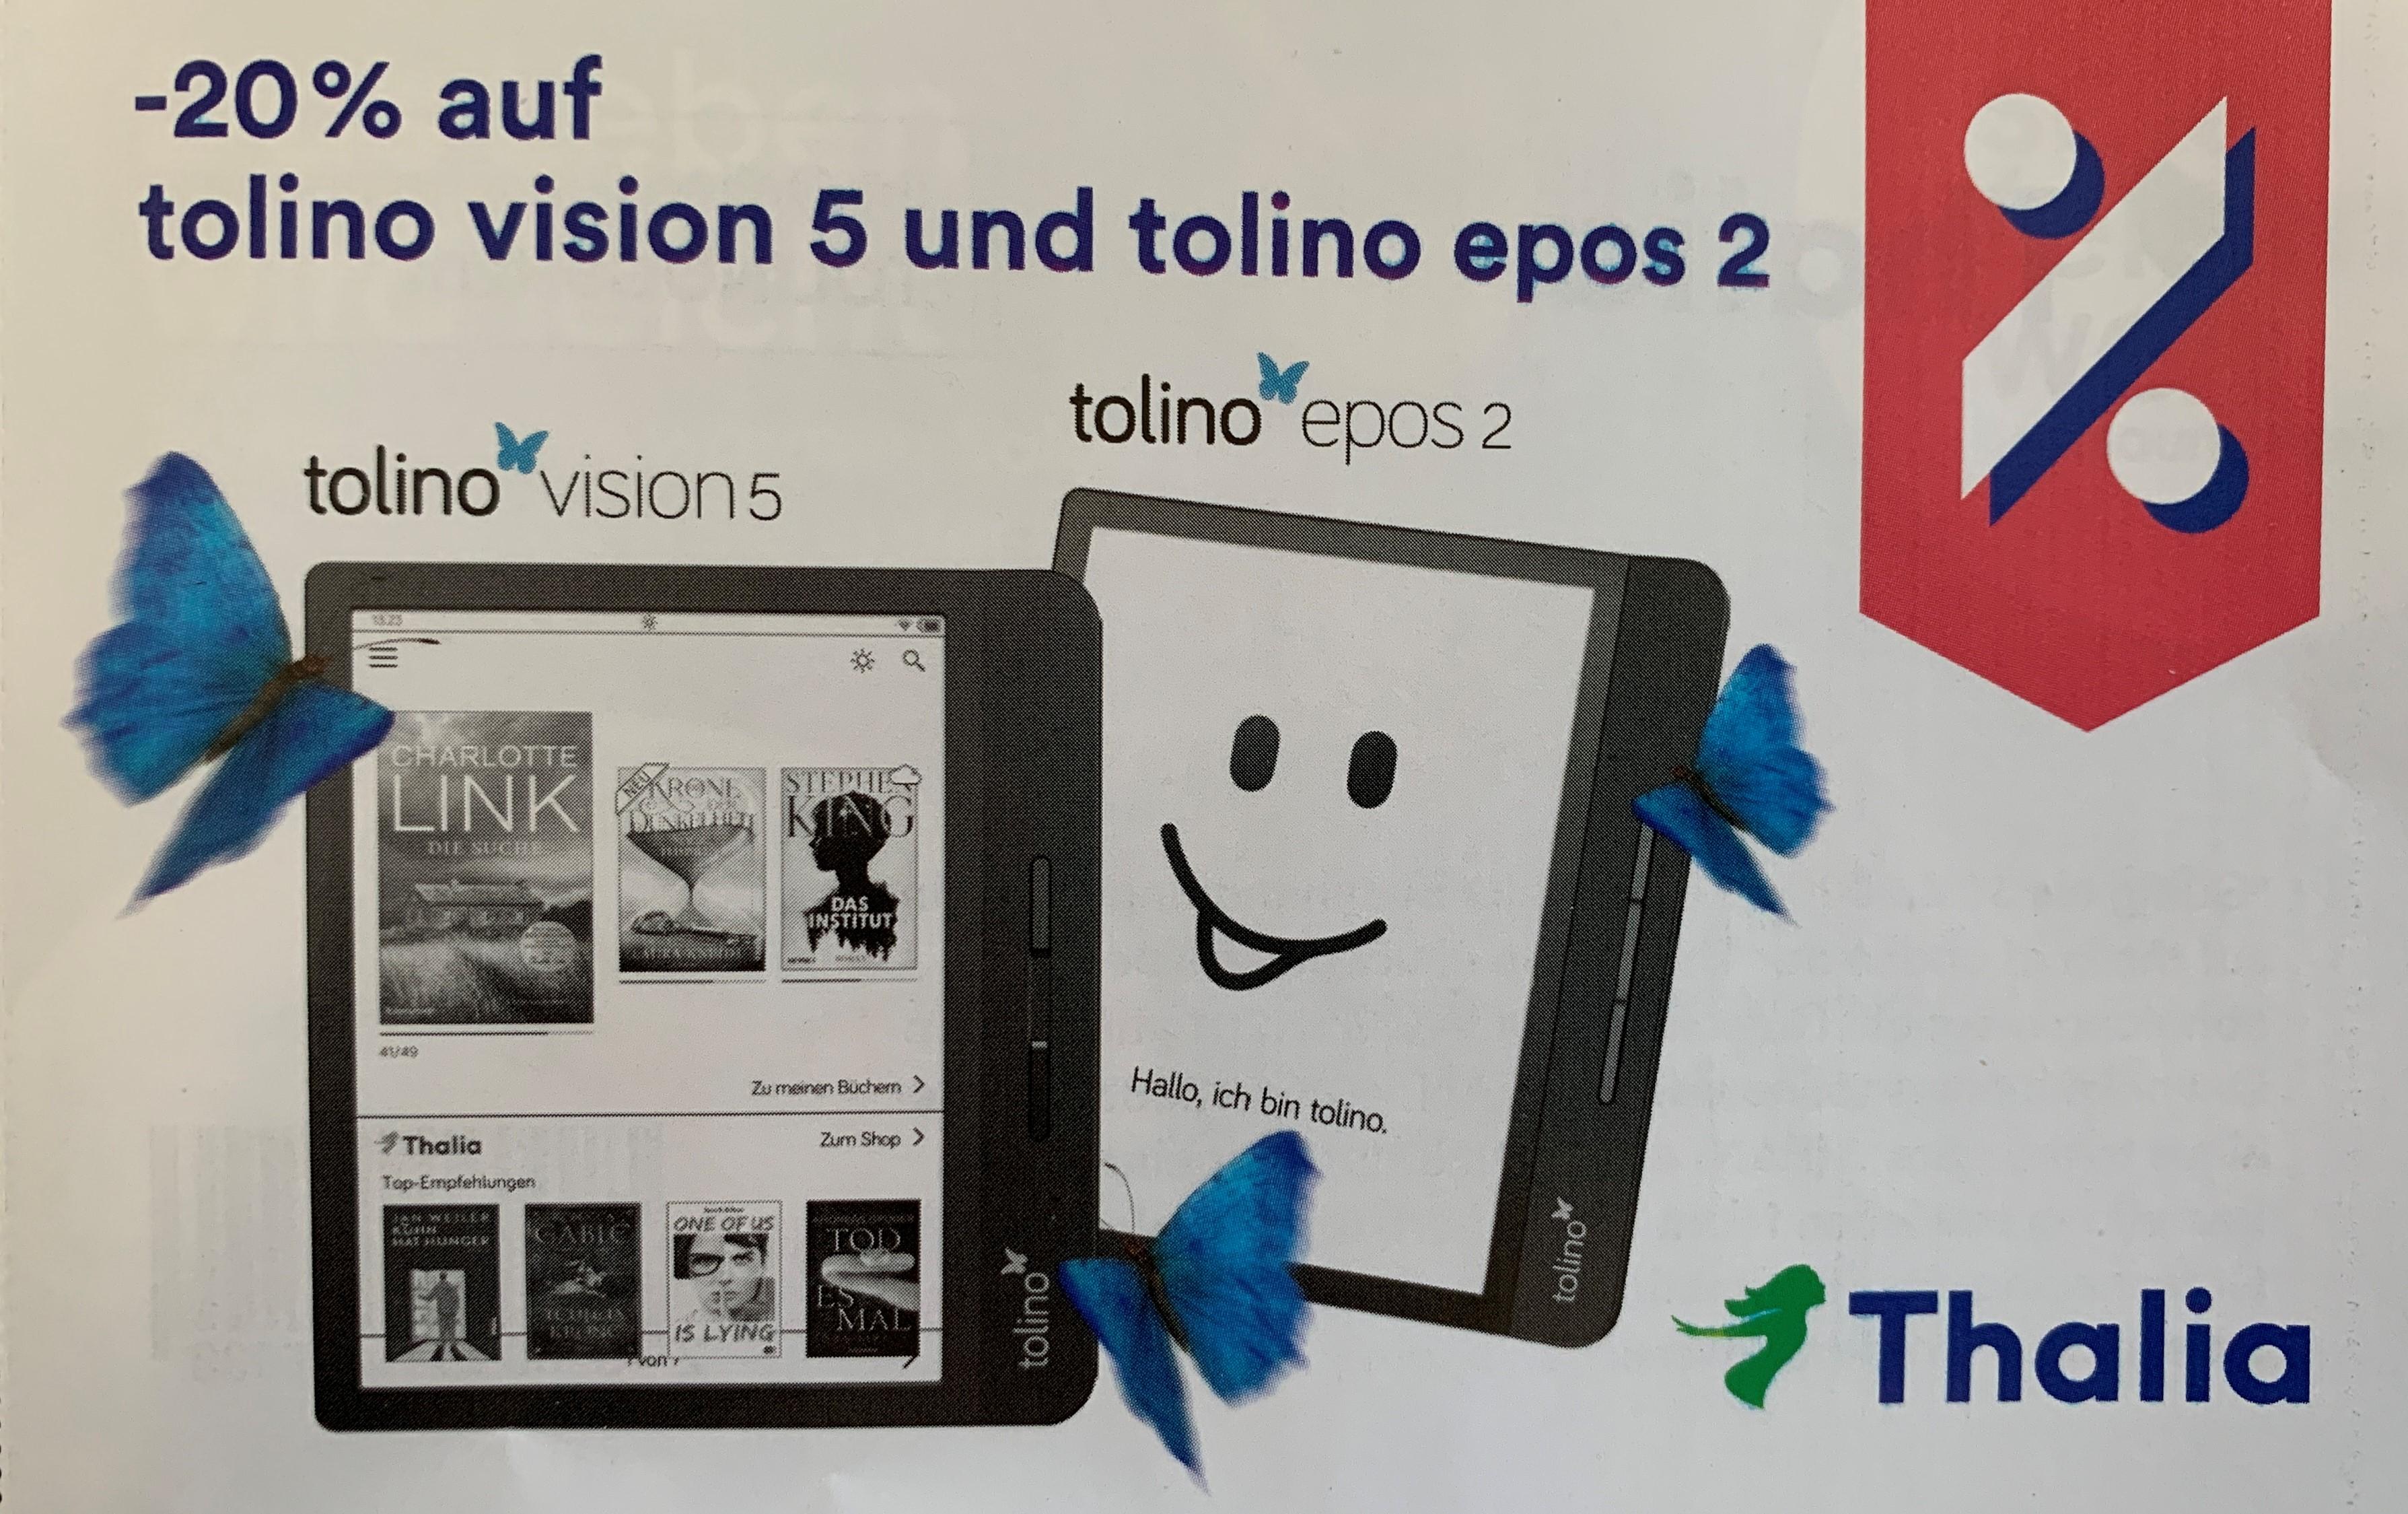 -20% auf tolino vision 5 und tolino epos 2